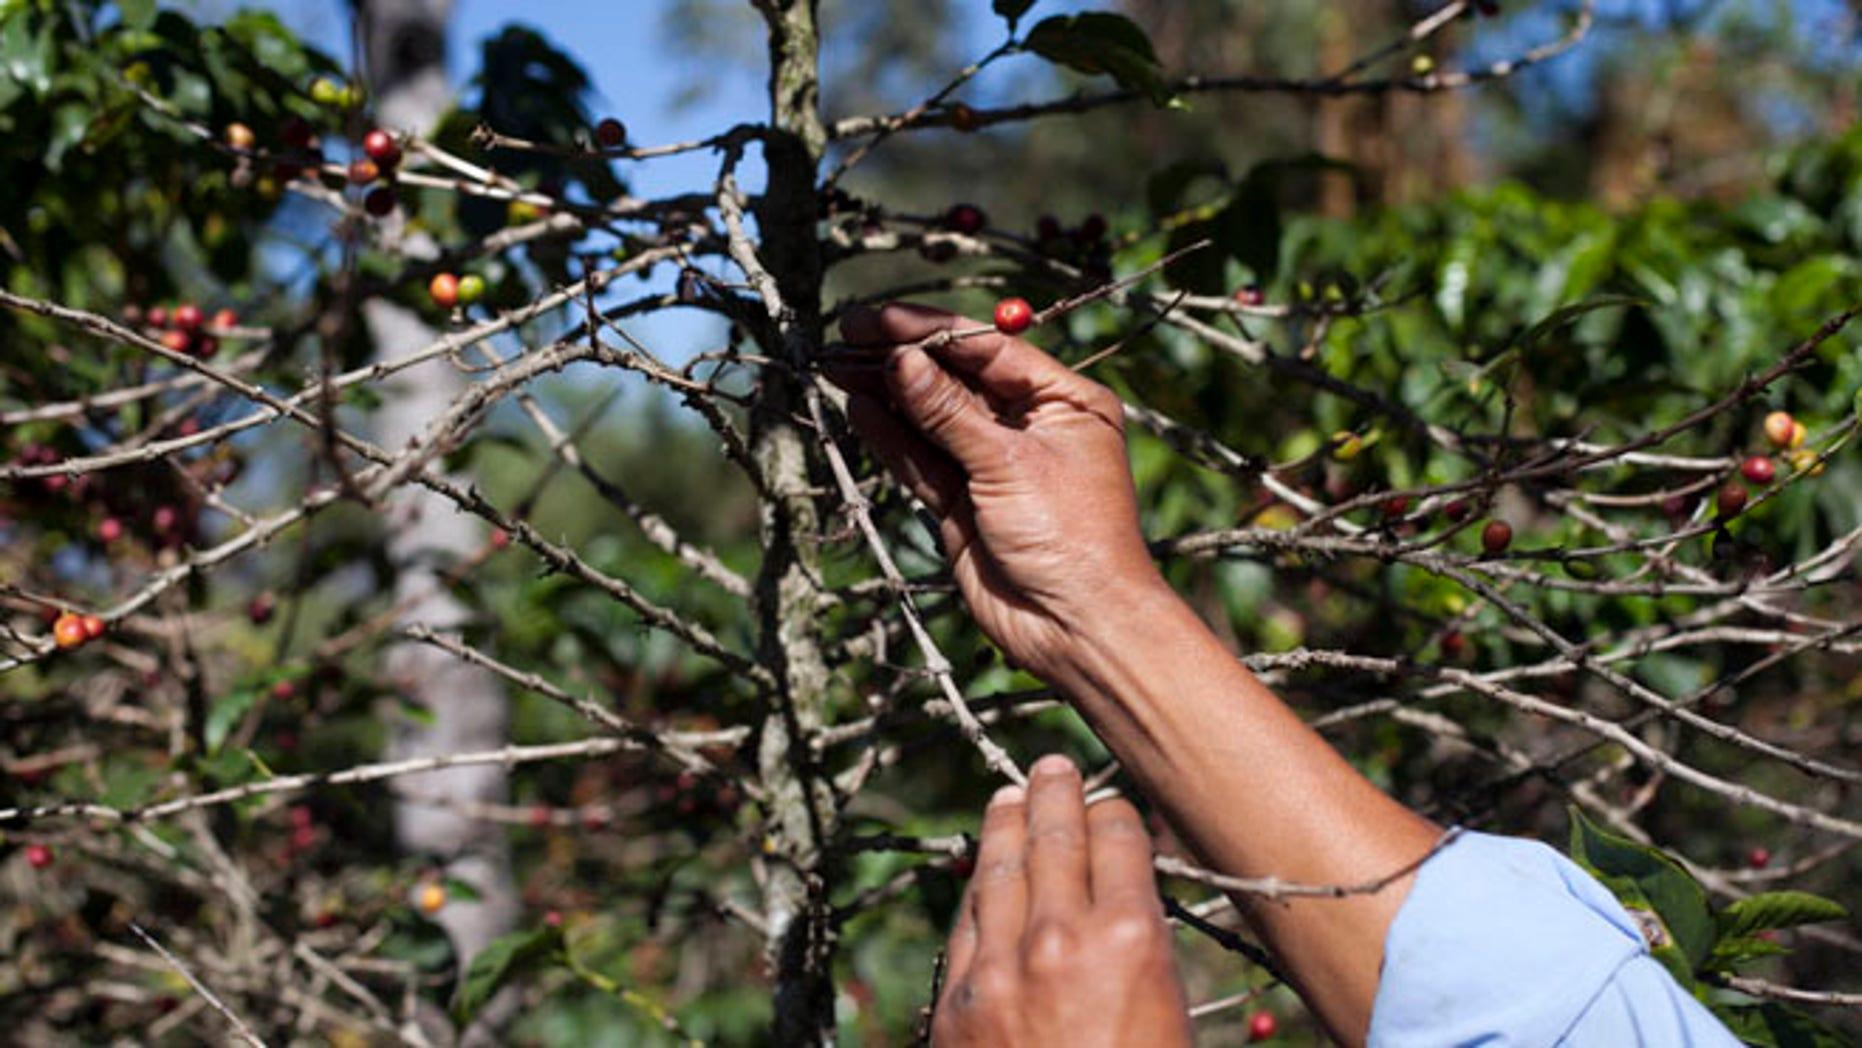 Feb. 9, 2013: Coffee beans damaged by the roya fungus in San Gaspar Vivar, Guatemala.